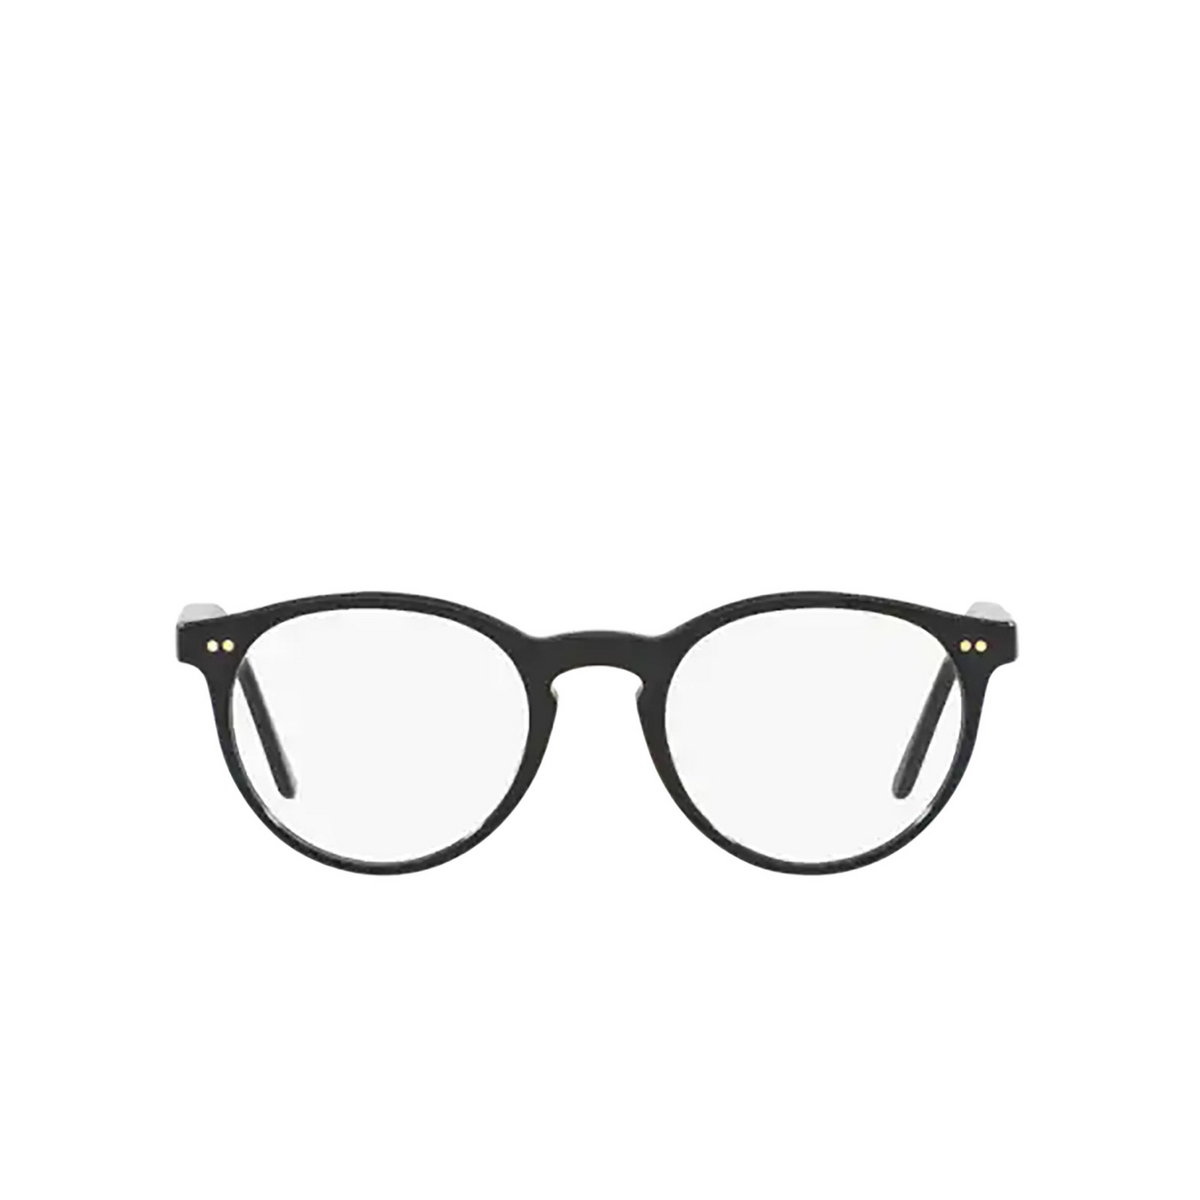 Polo Ralph Lauren® Round Eyeglasses: PH2083 color Shiny Black 5001.